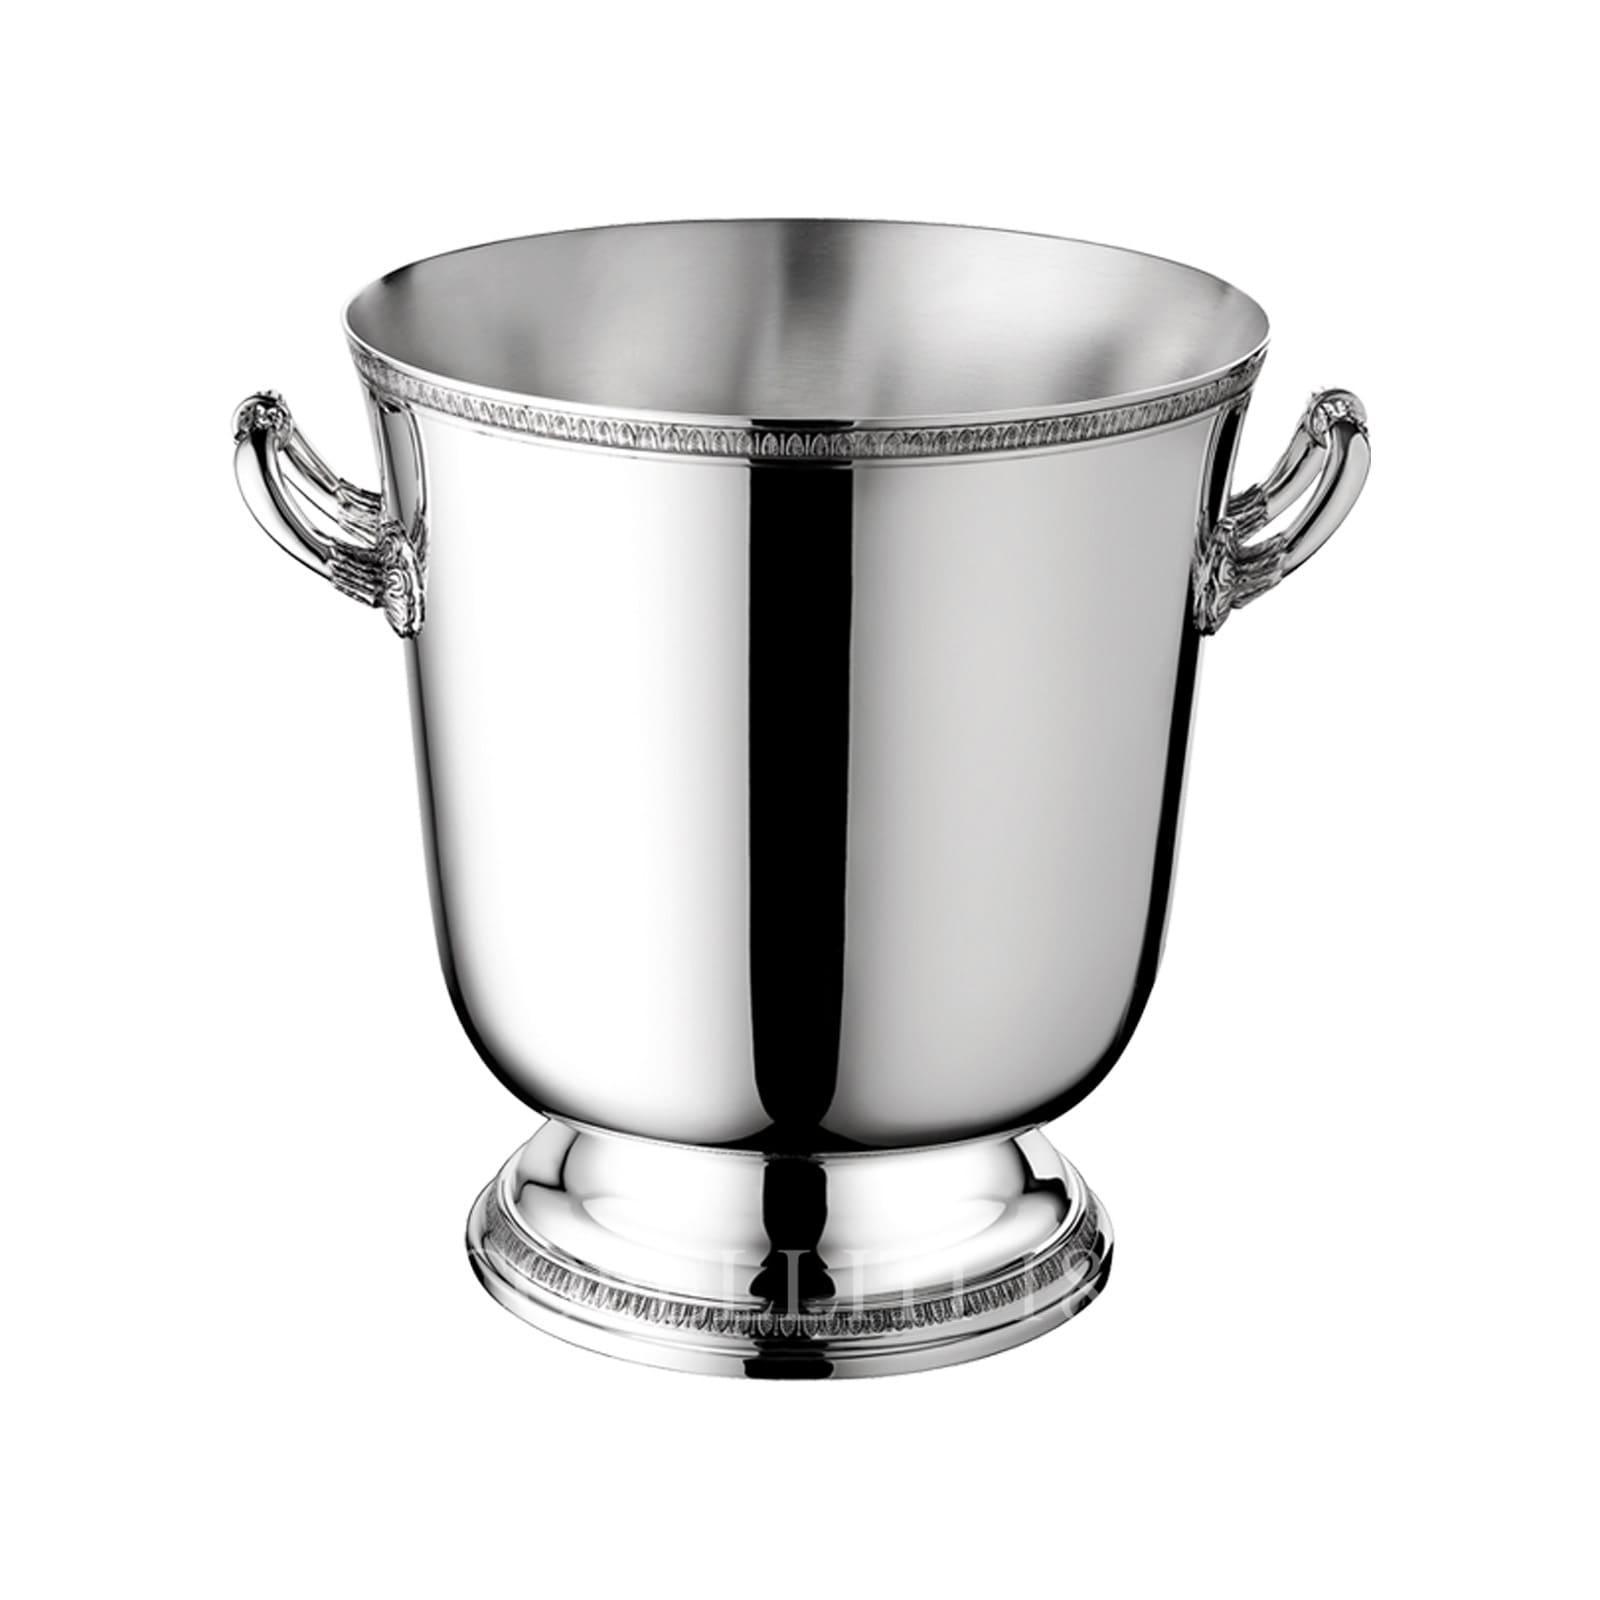 christofle silver plated malmaison ice bucket